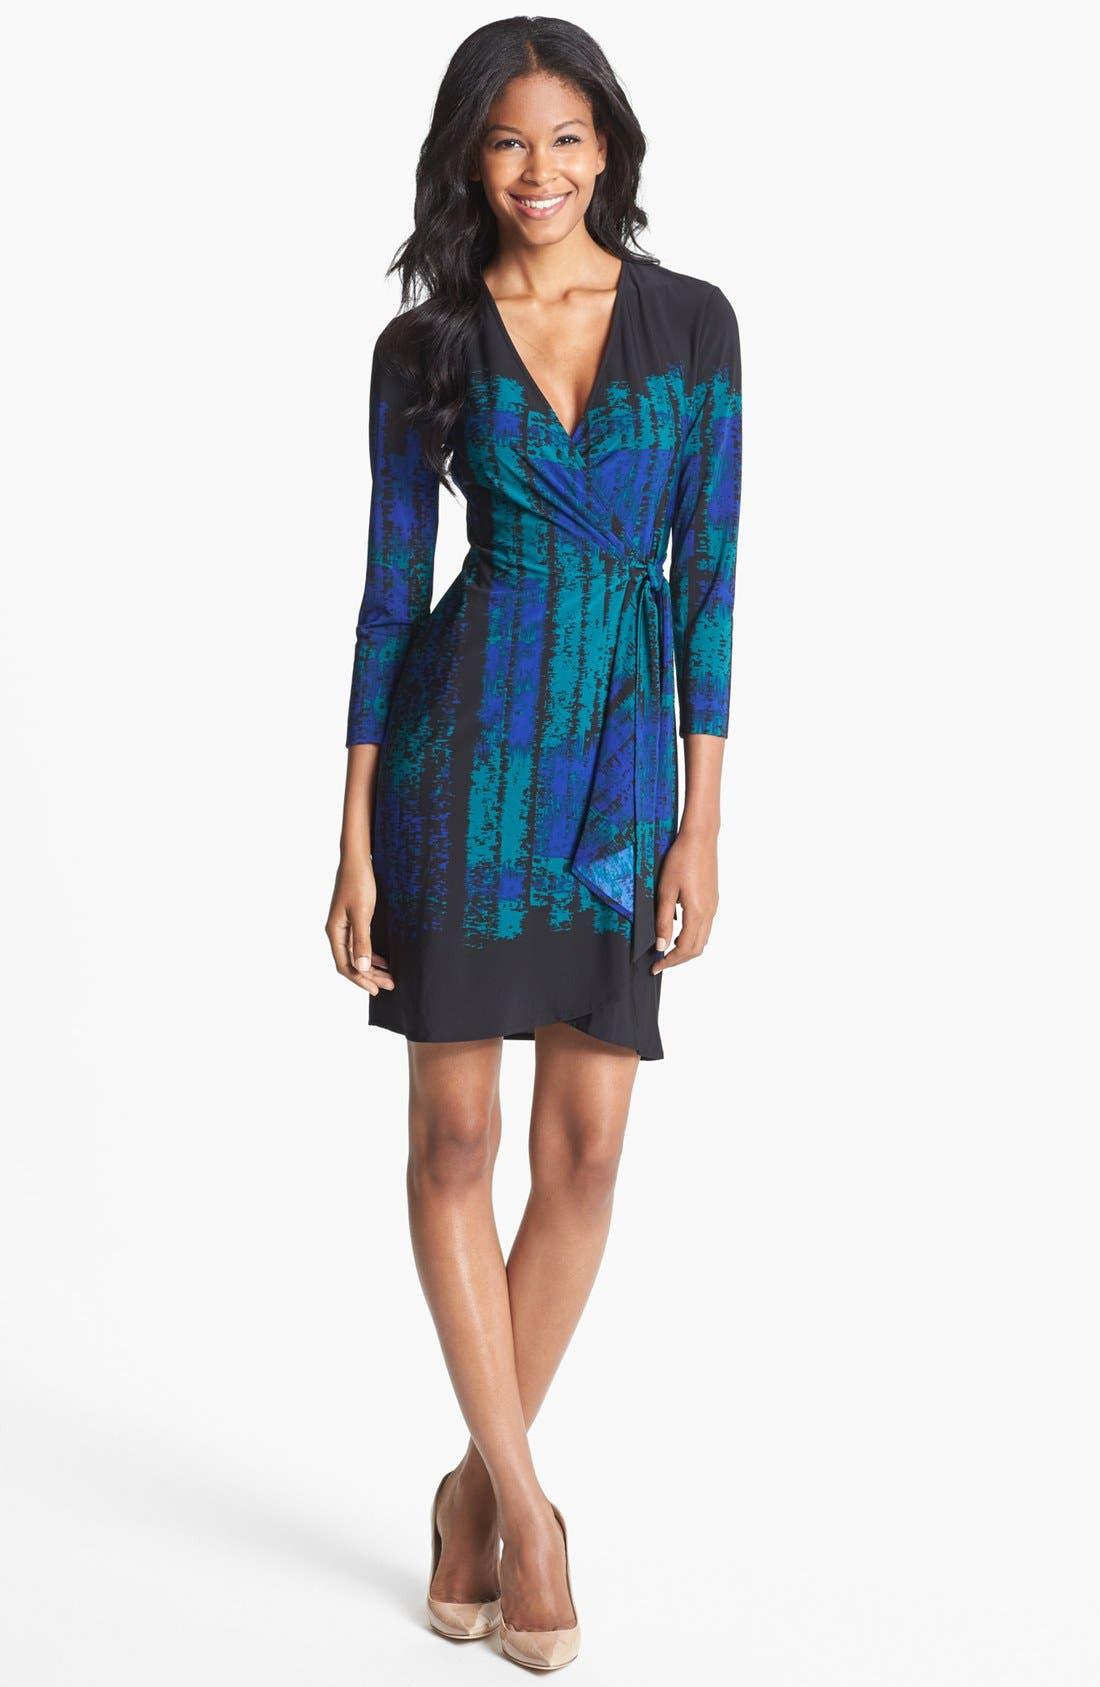 Main Image - BCBGMAXAZRIA 'Adele' Print Jersey Wrap Dress